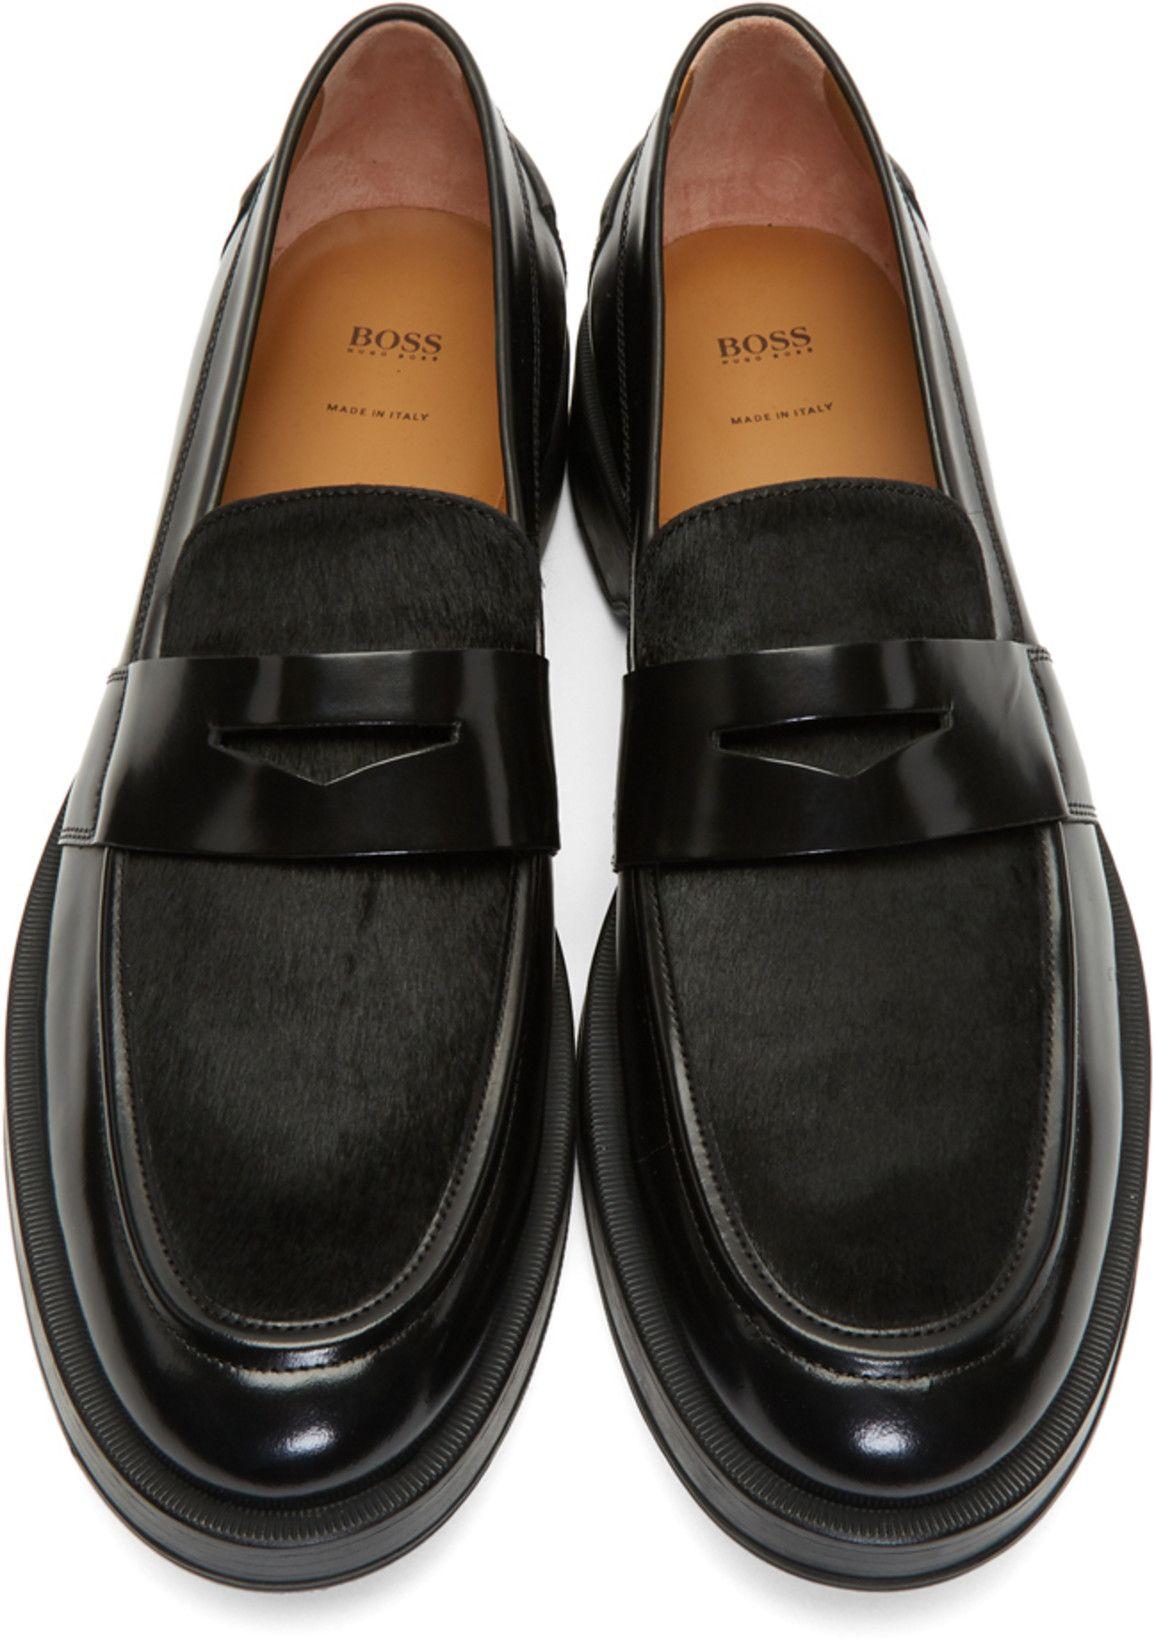 cc5e3824925 BOSS Black Calf-Hair Loafers in 2019